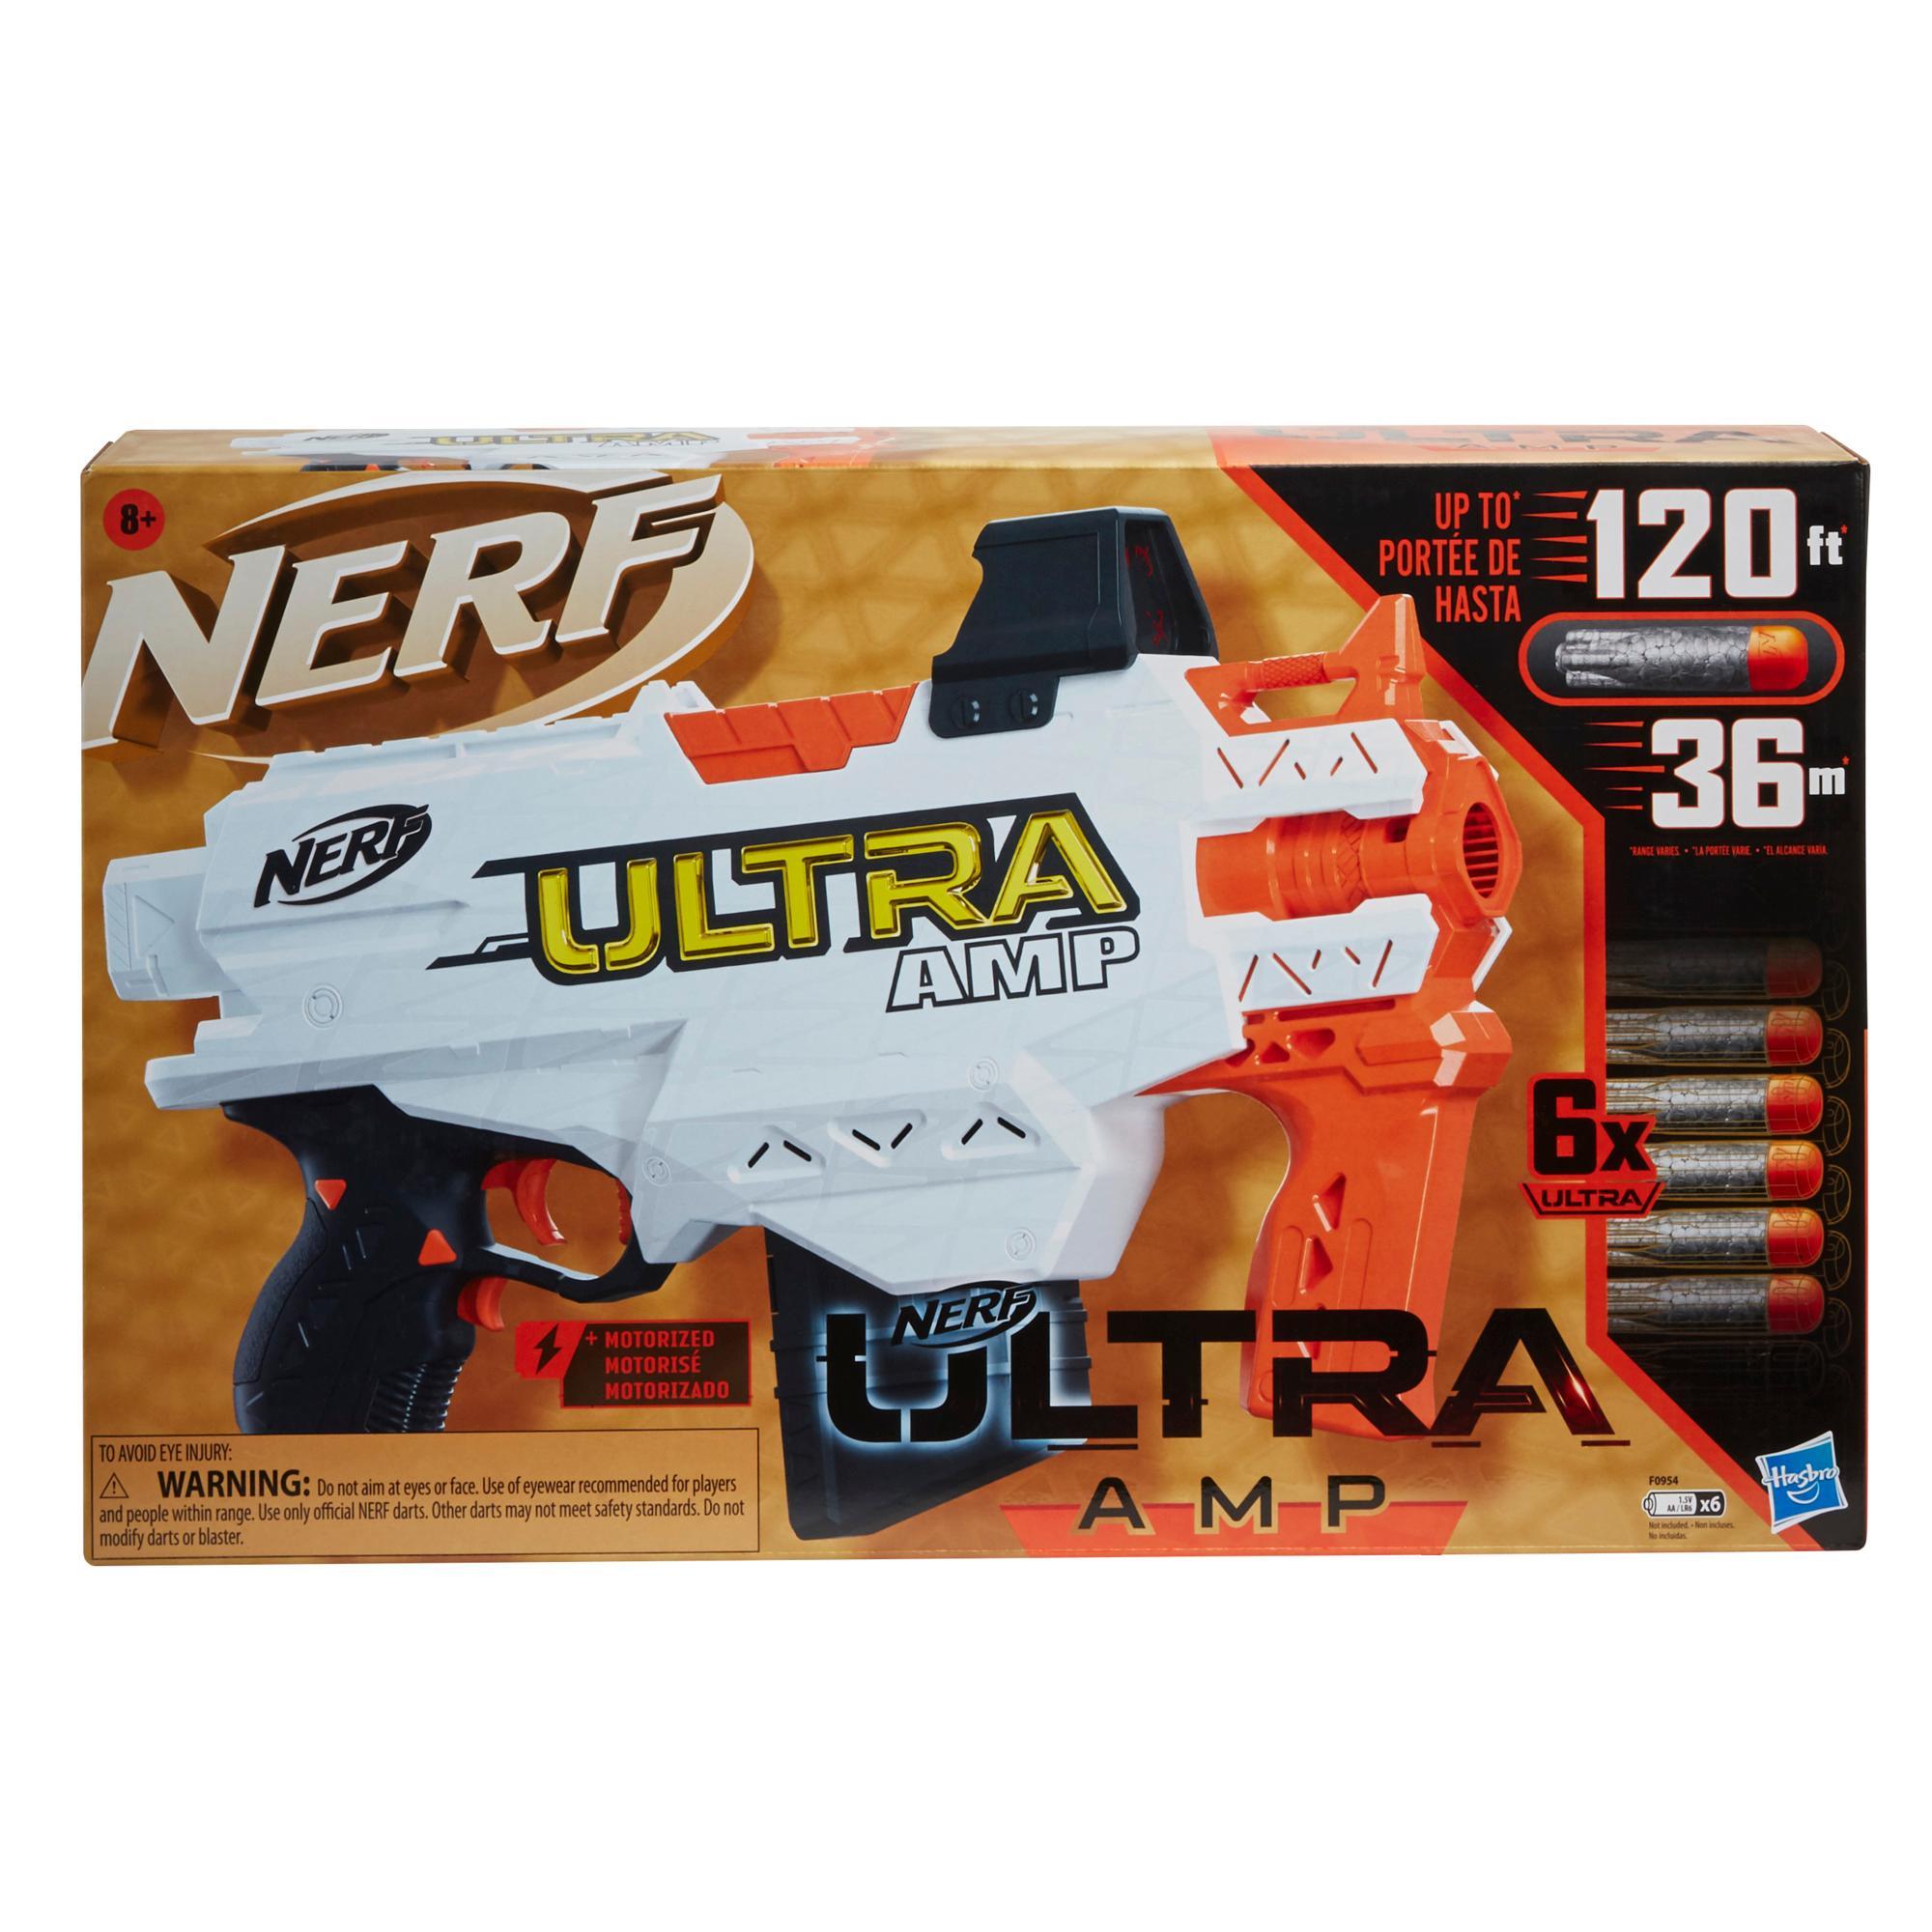 Nerf Ultra Amp